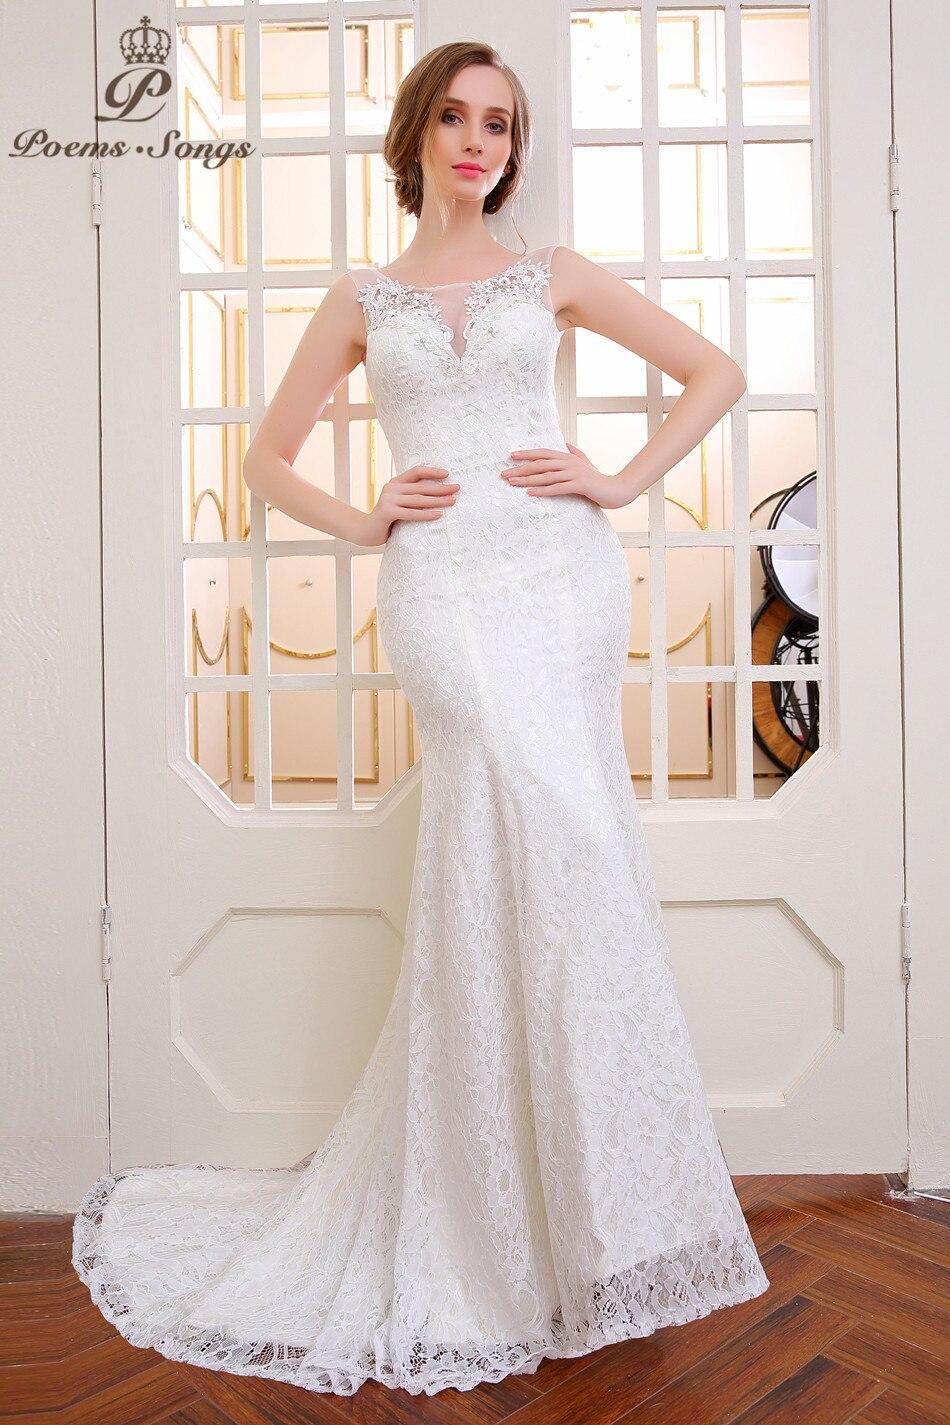 Poemssongs lace flower mermaid wedding dress 15 vestido de noiva sereia  com renda arabische abendkleider bridal dress